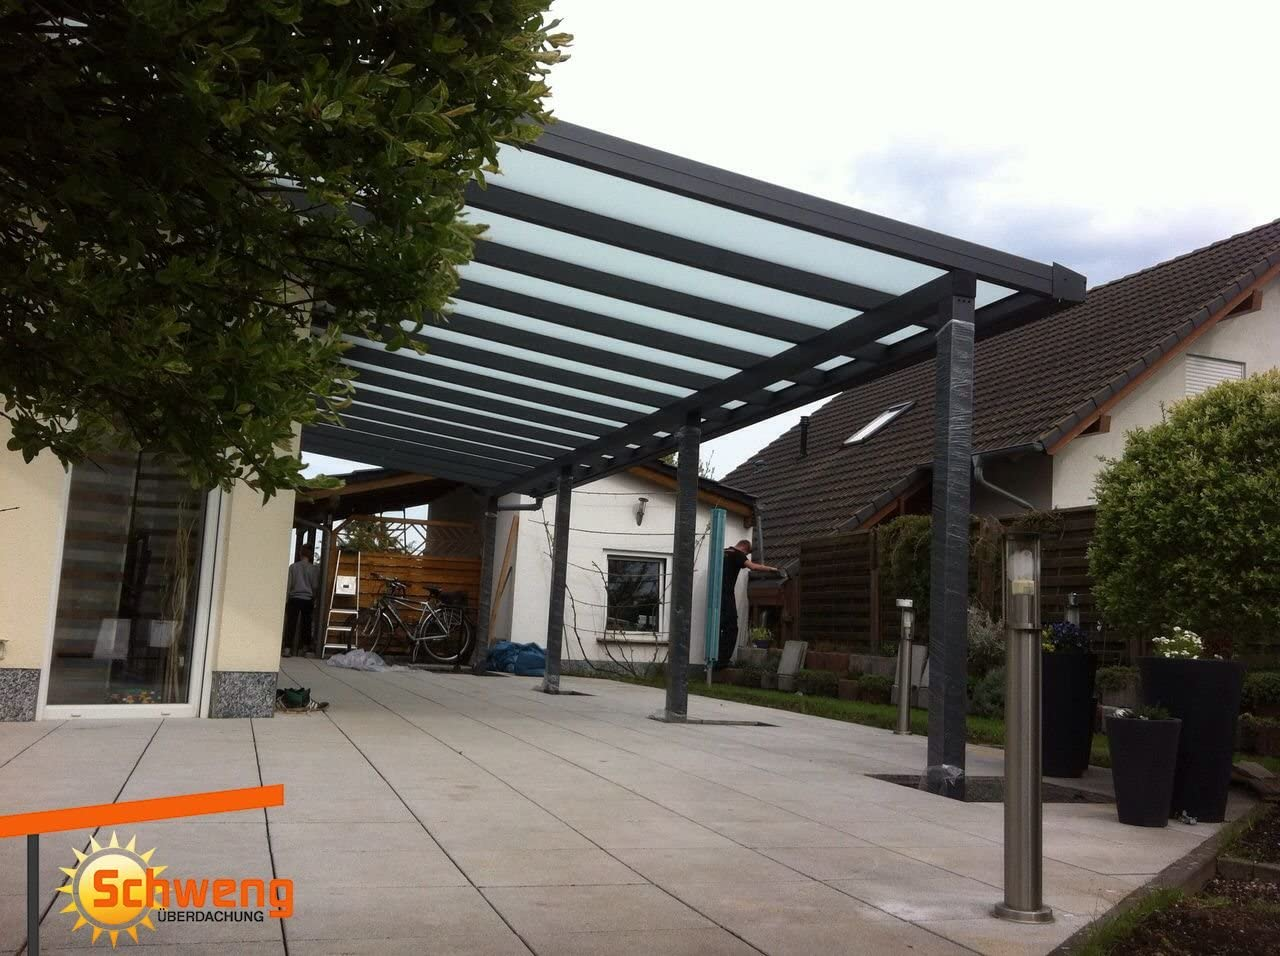 Dosel para terraza fabricado con placas de policarbonato de ...